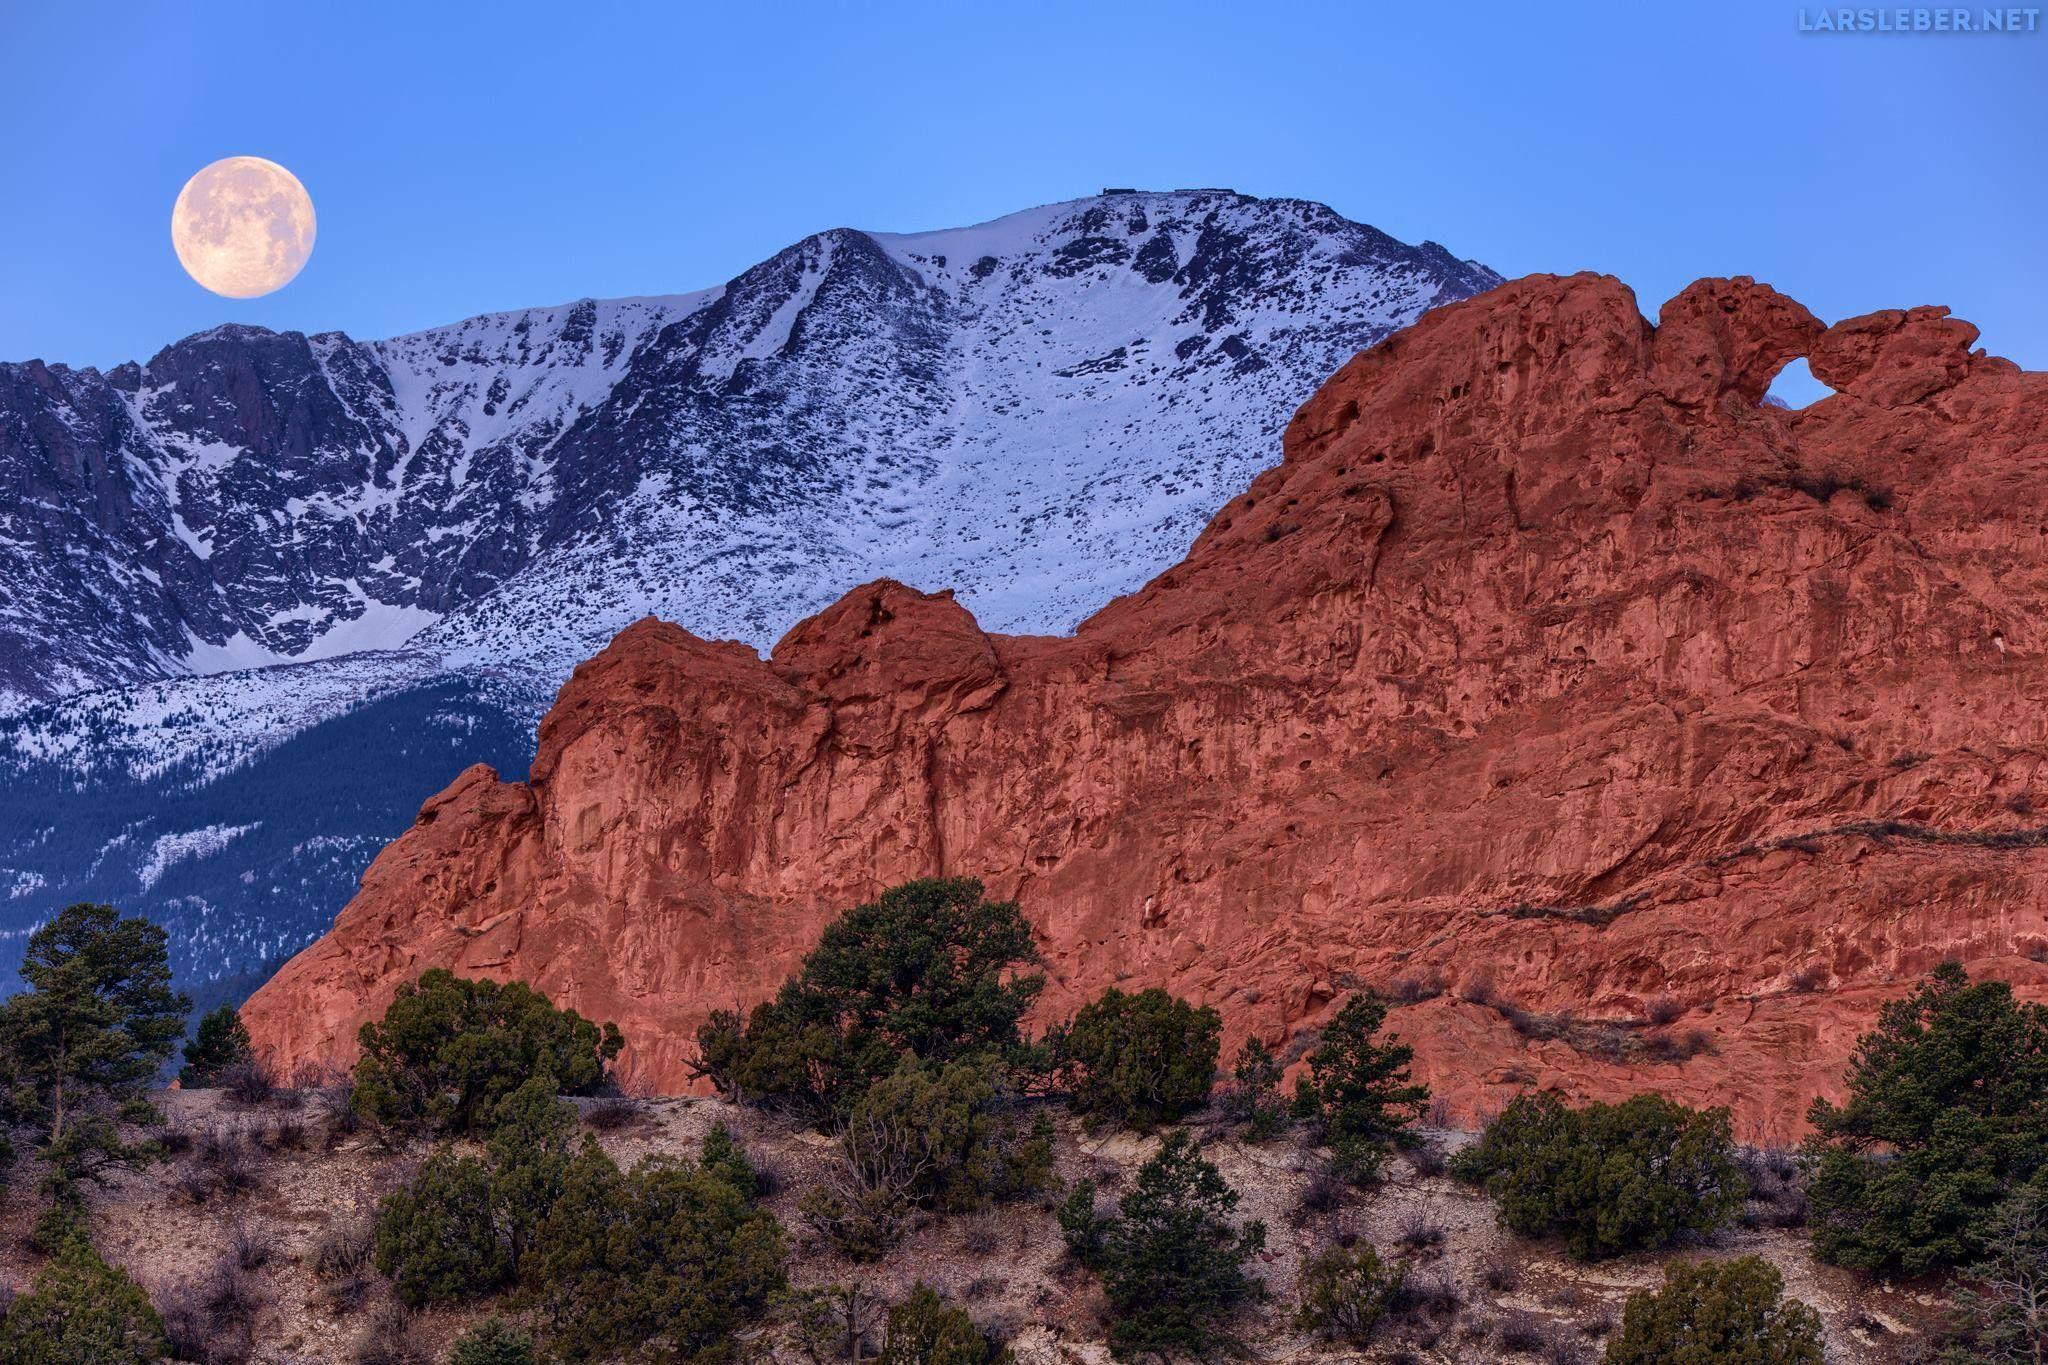 Pikes Peak Moonset Colorado Springs 04 12 2017 Beautiful Landscape Photography Landscape Photography Beautiful Landscapes